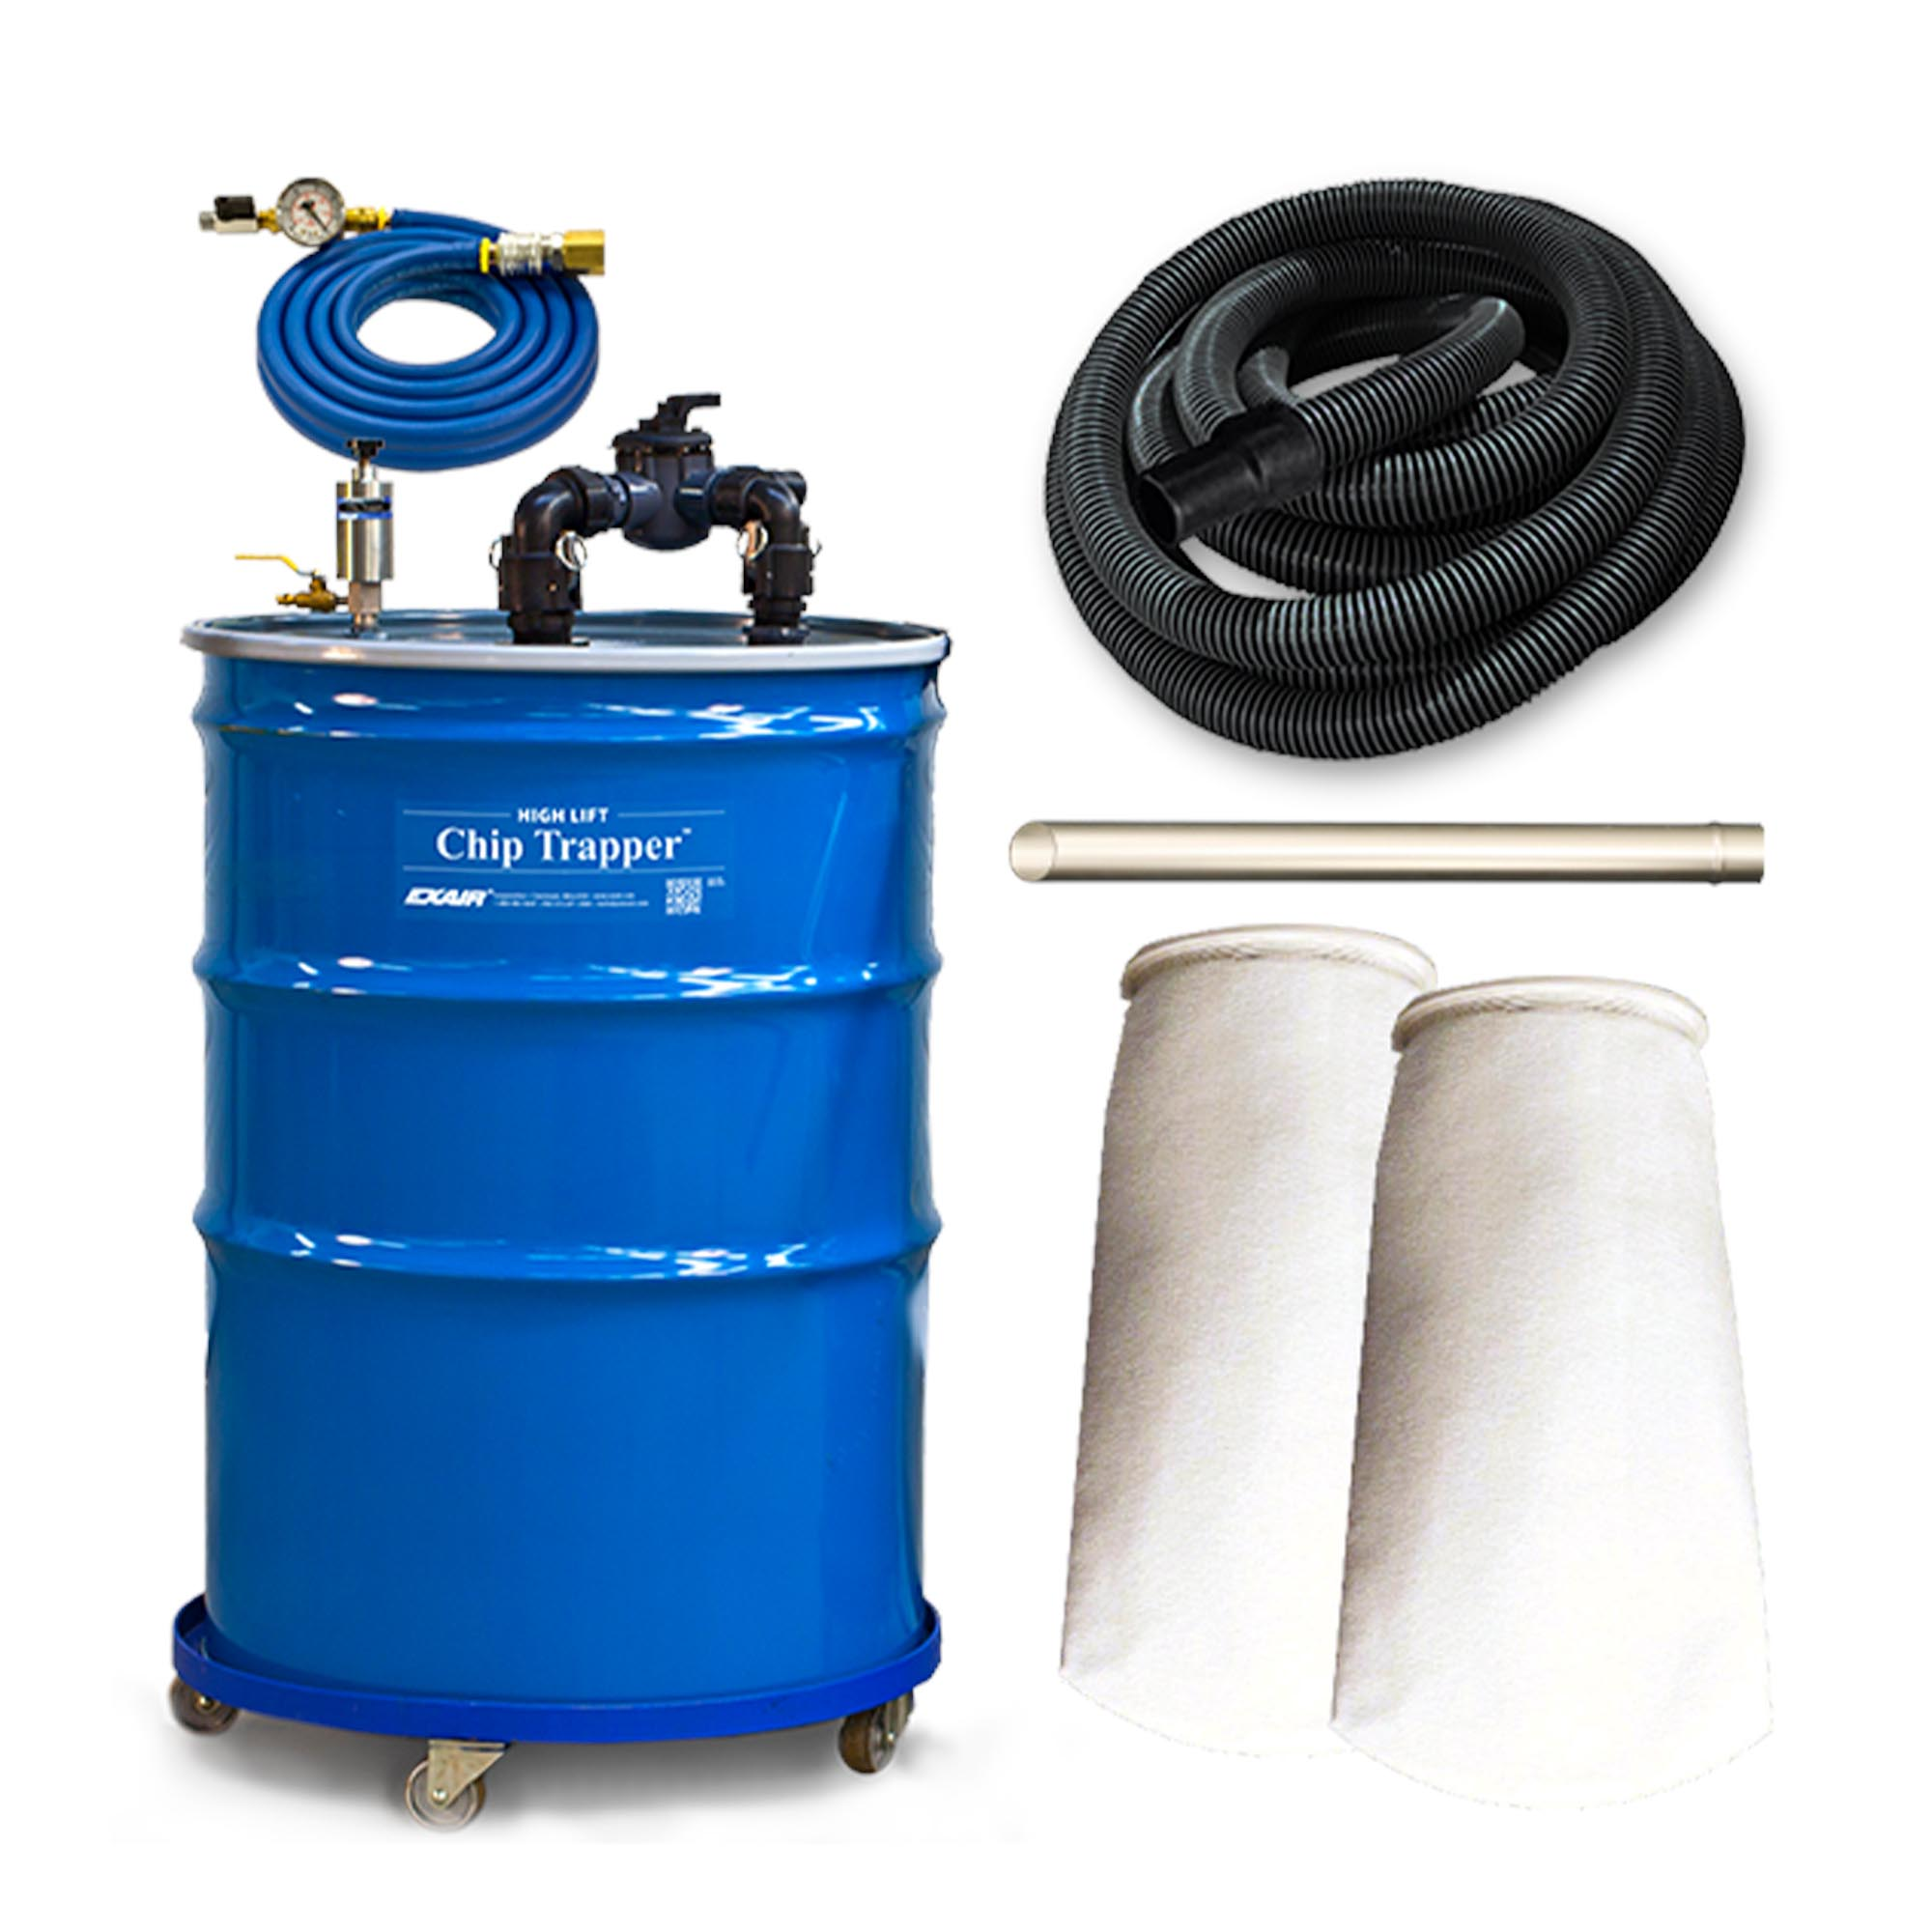 Model 6190-110 110 Gallon High Lift Chip Trapper Vacuum System